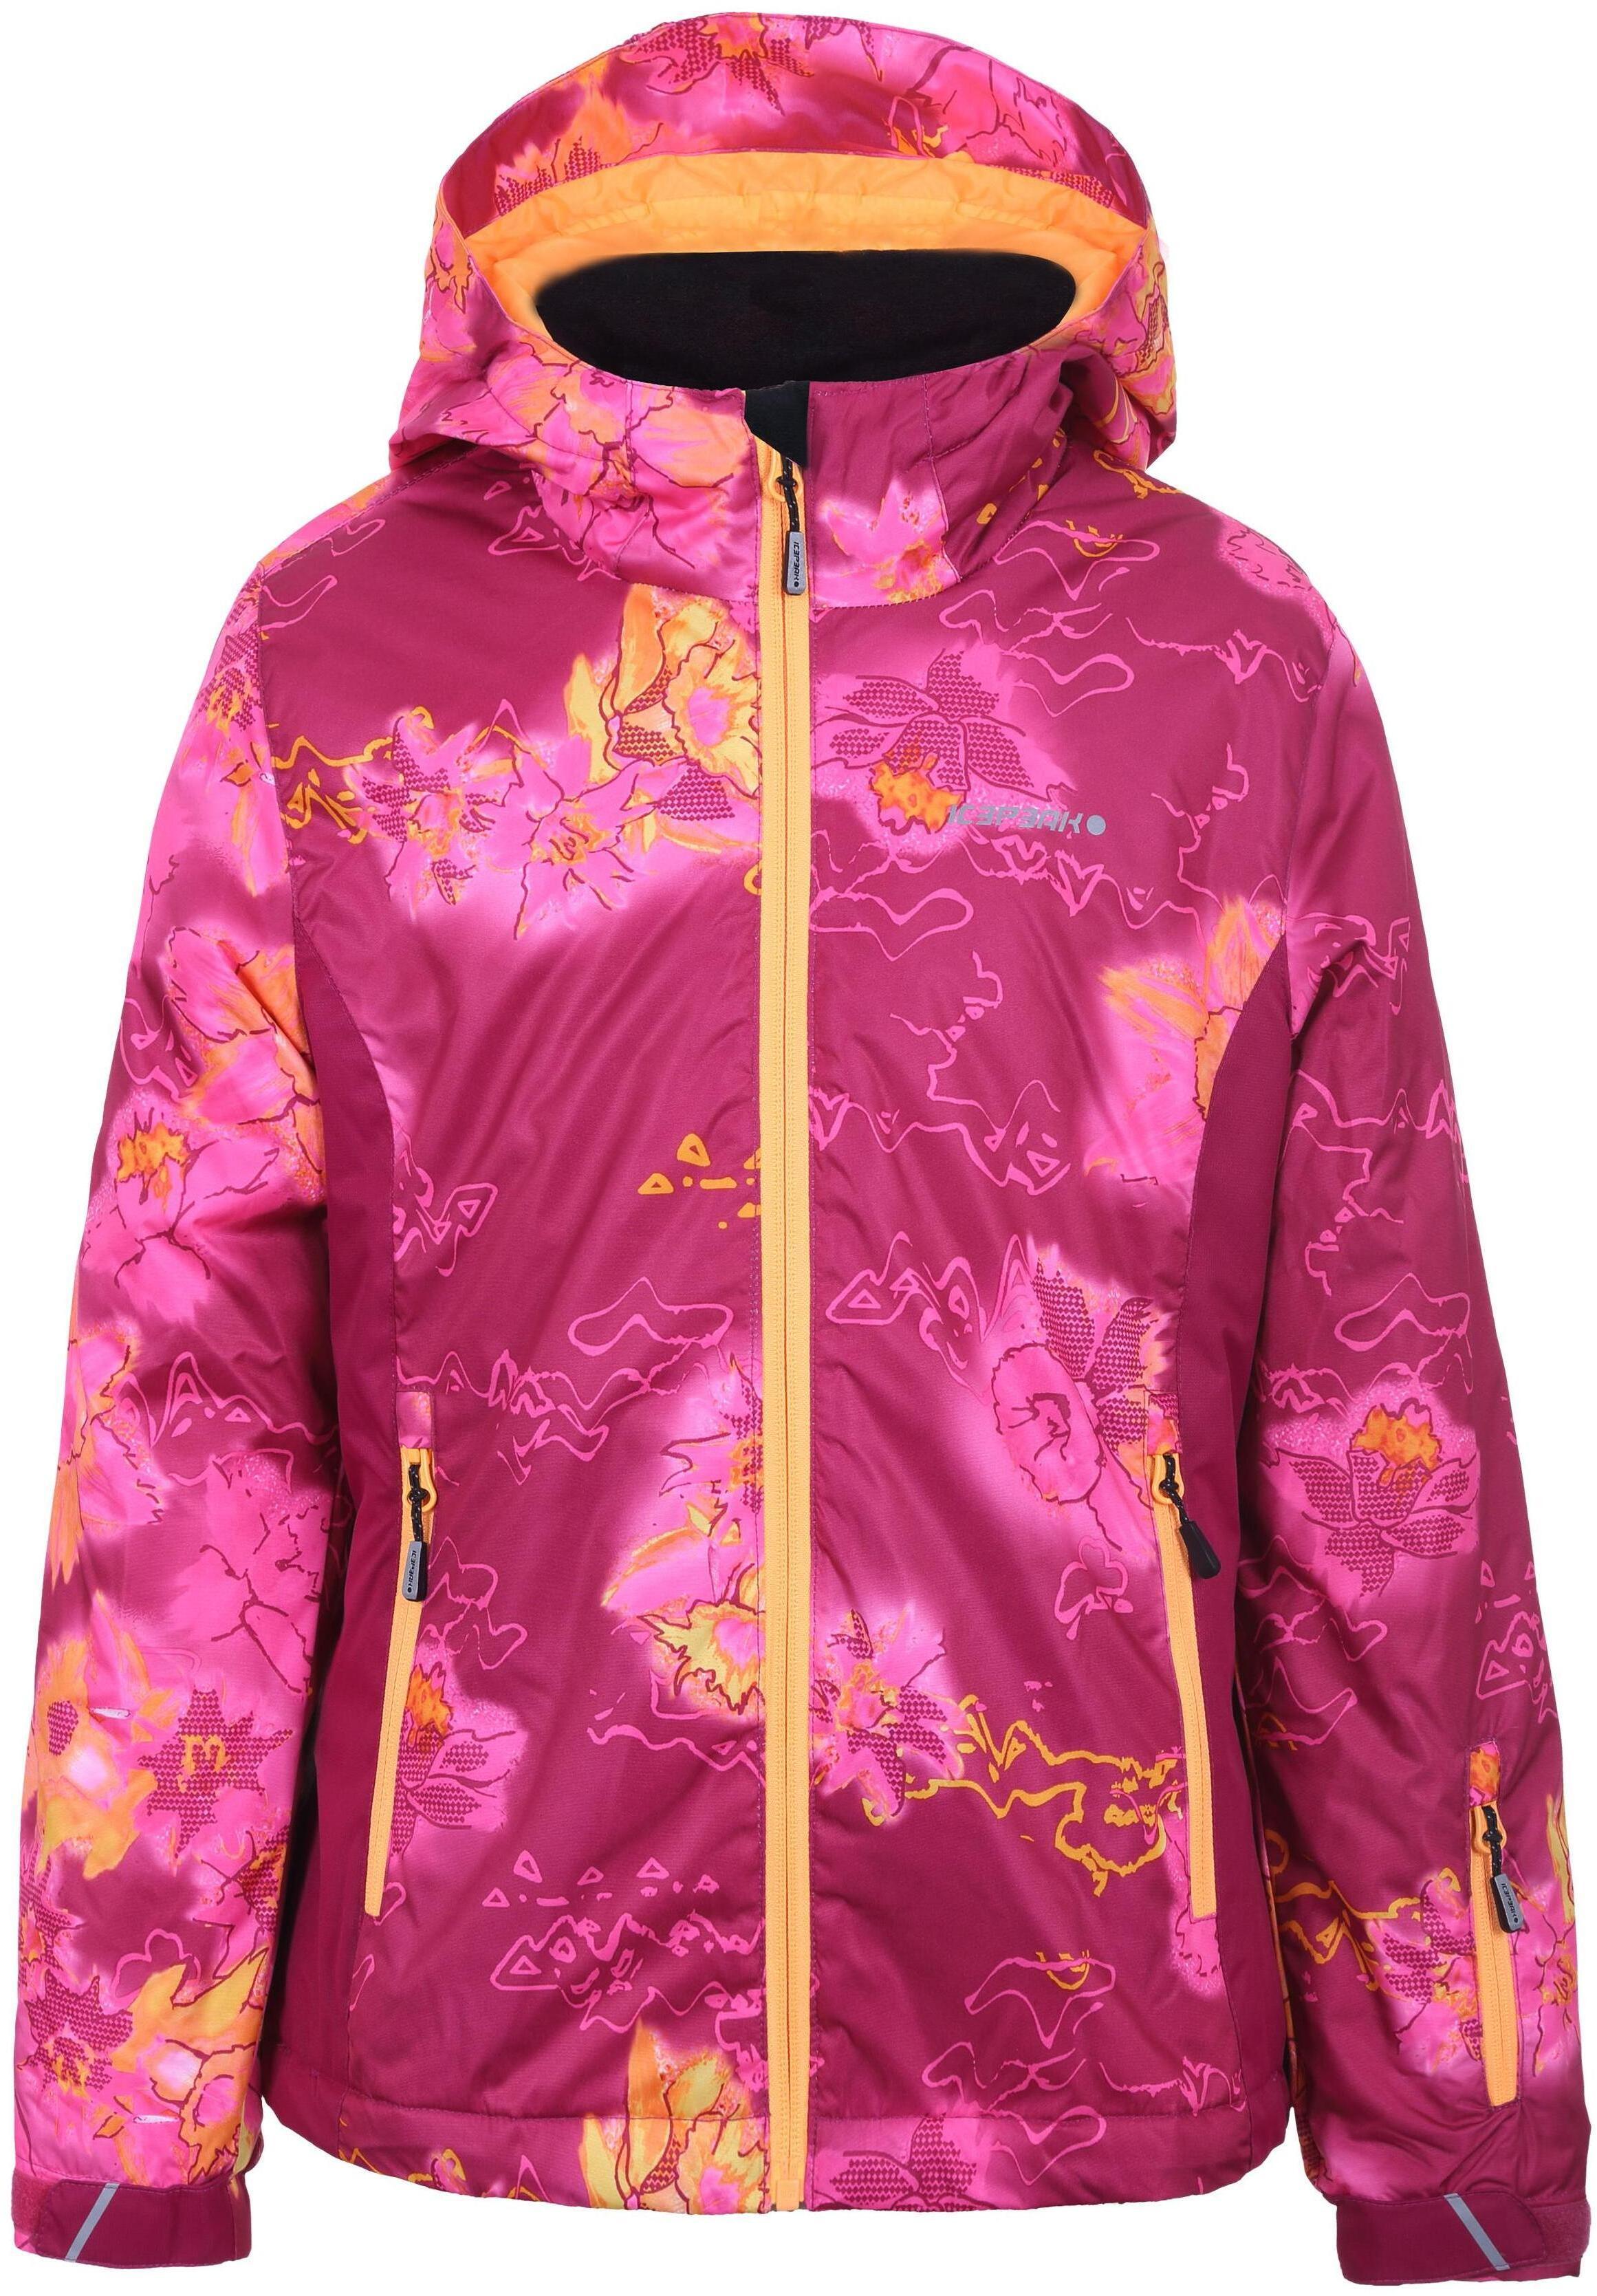 Купить Куртка горнолыжная Icepeak 2019-20 Linn Jr Hot Pink, р. 152,